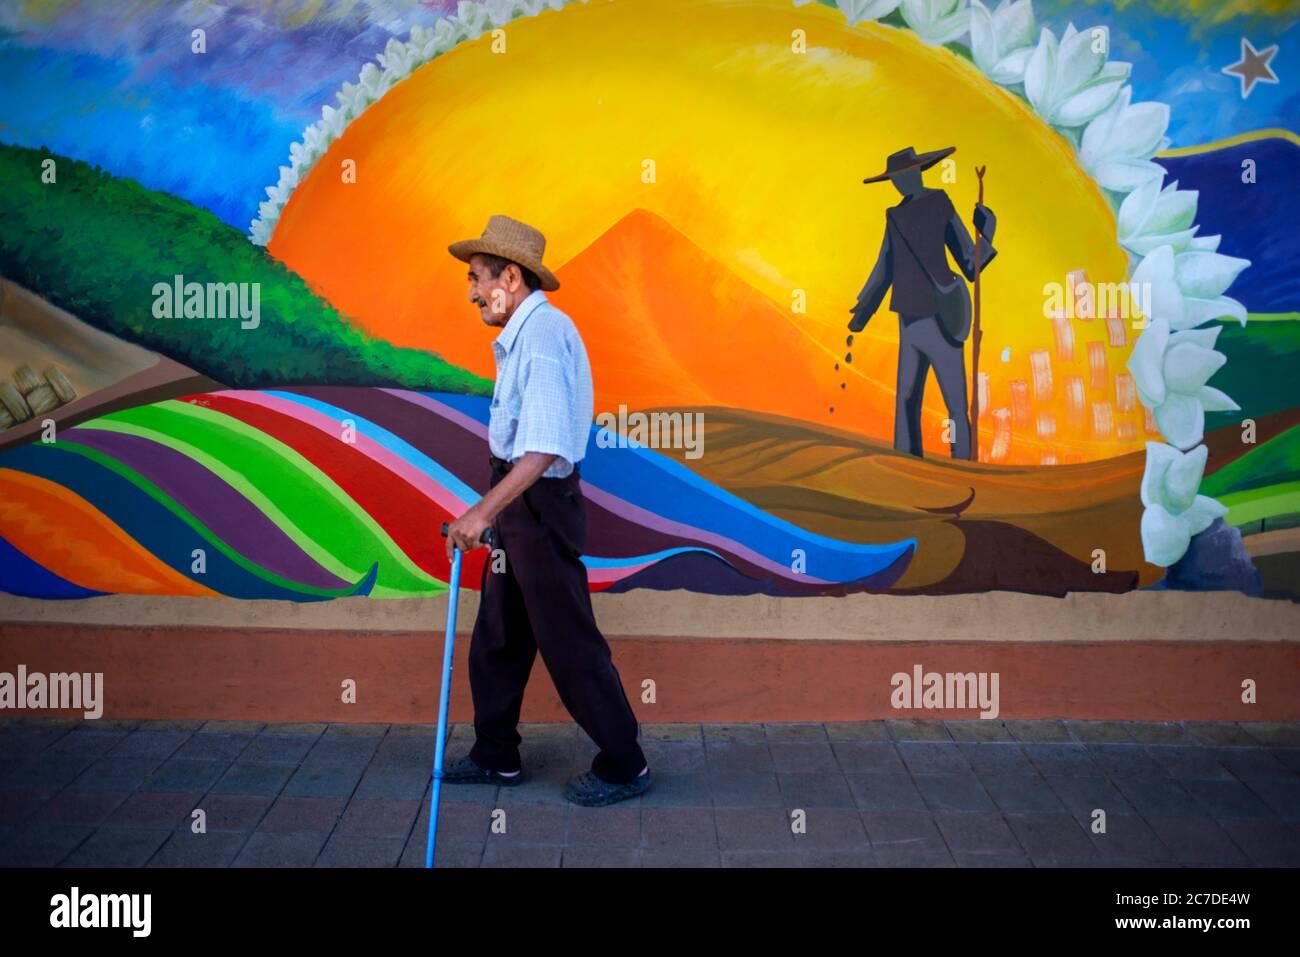 Wall street art graffiti in Nahuizalco Sonsonate El Salvador Central America. Ruta De Las Flores, Department Of Sonsonate. Stock Photo